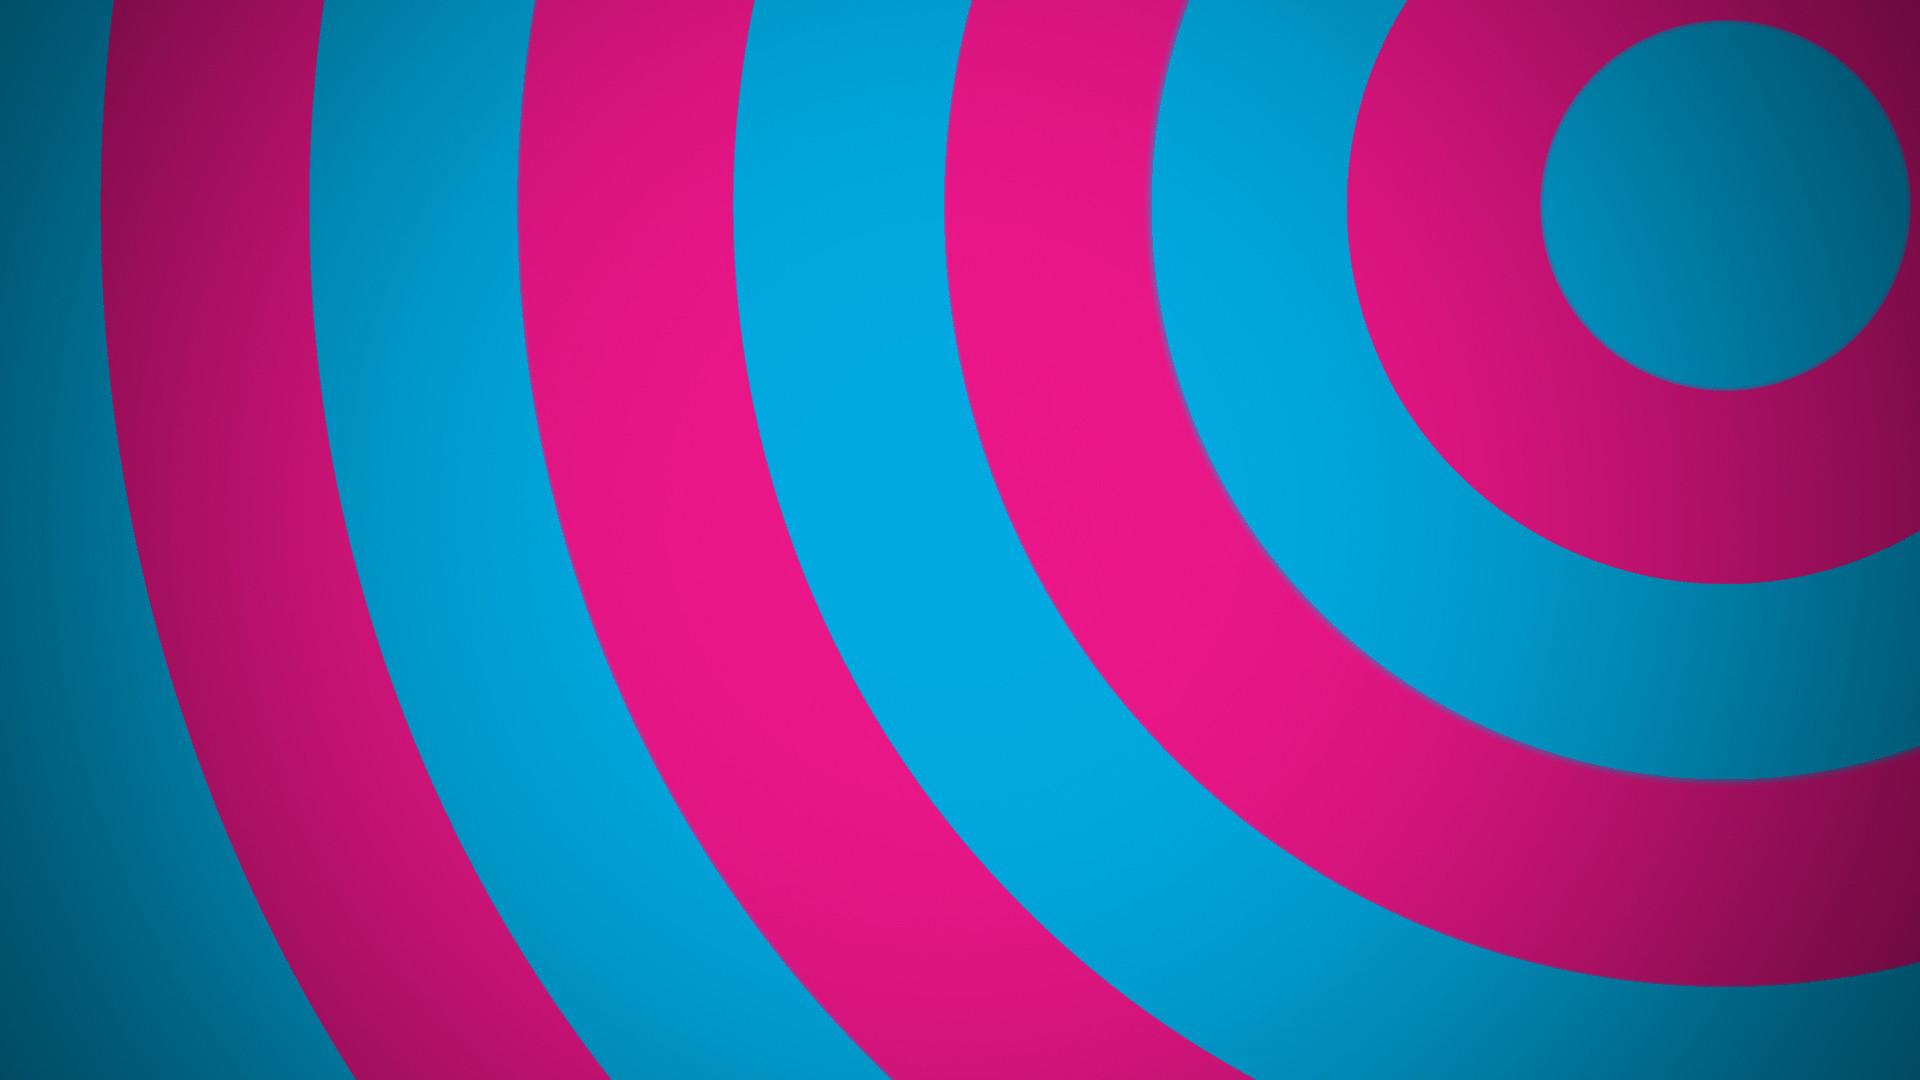 circle wallpaper blue pink background hd desktop wallpapers